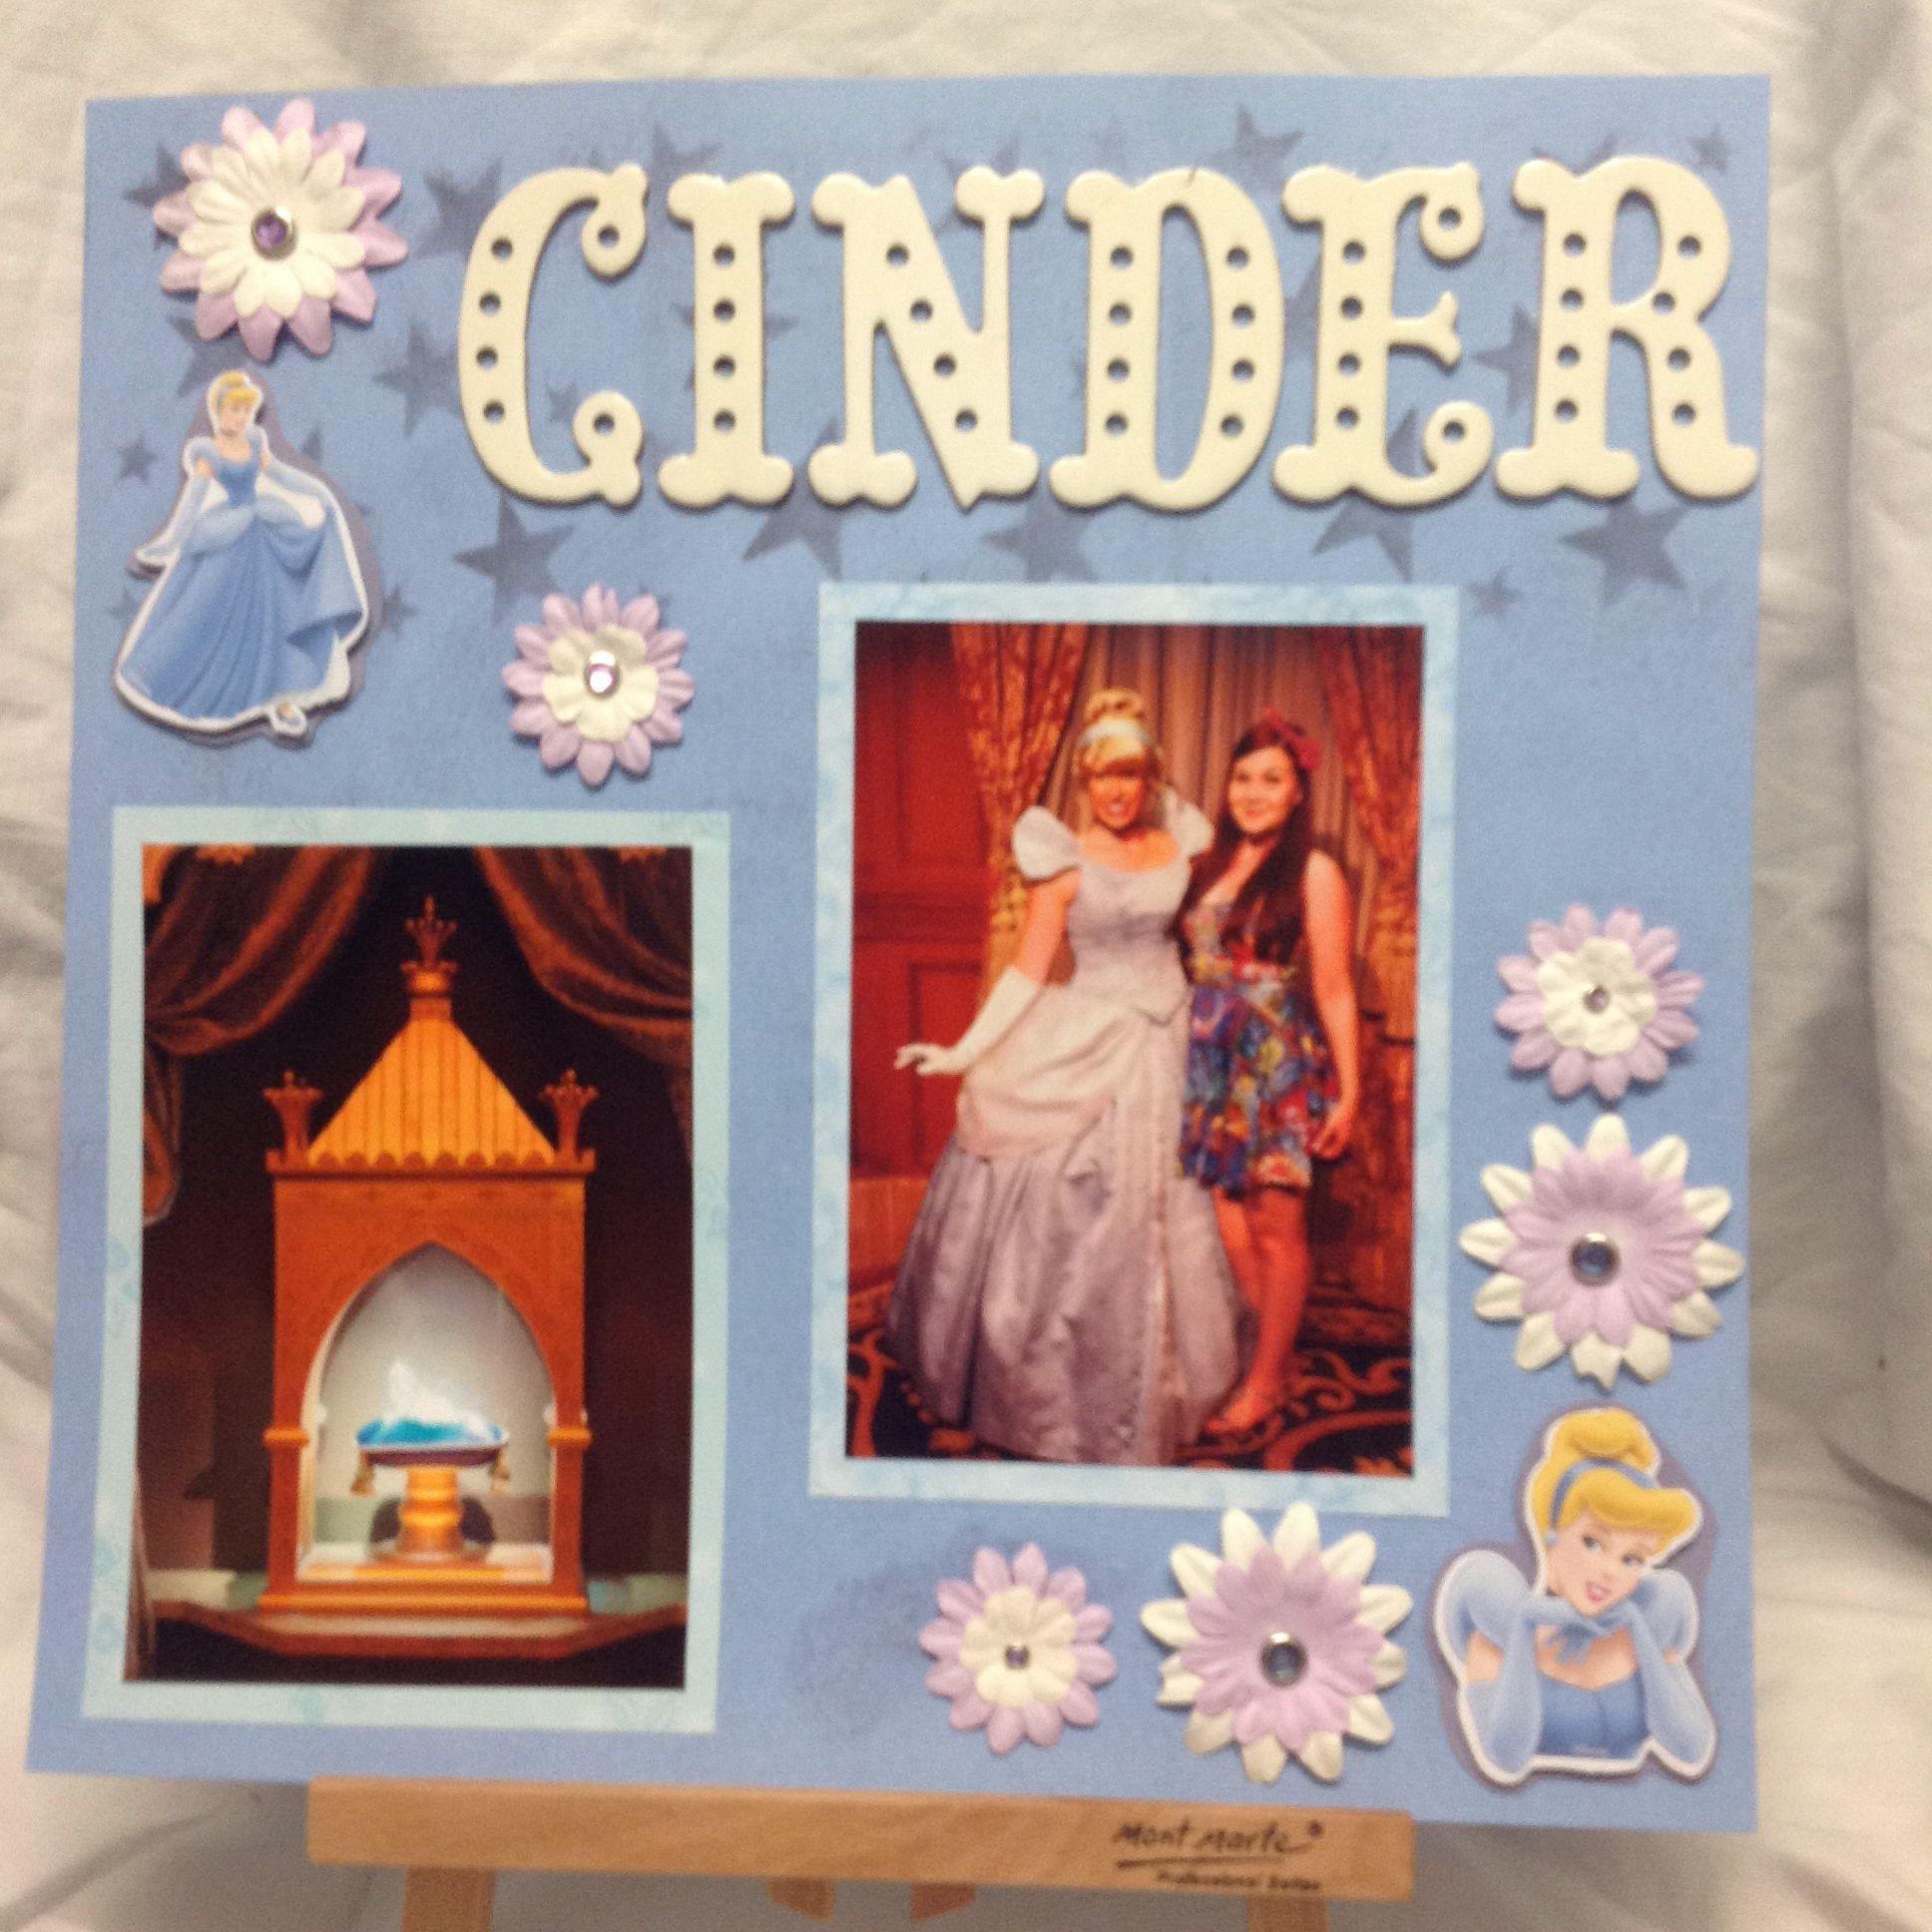 Phoebe with Cinderella